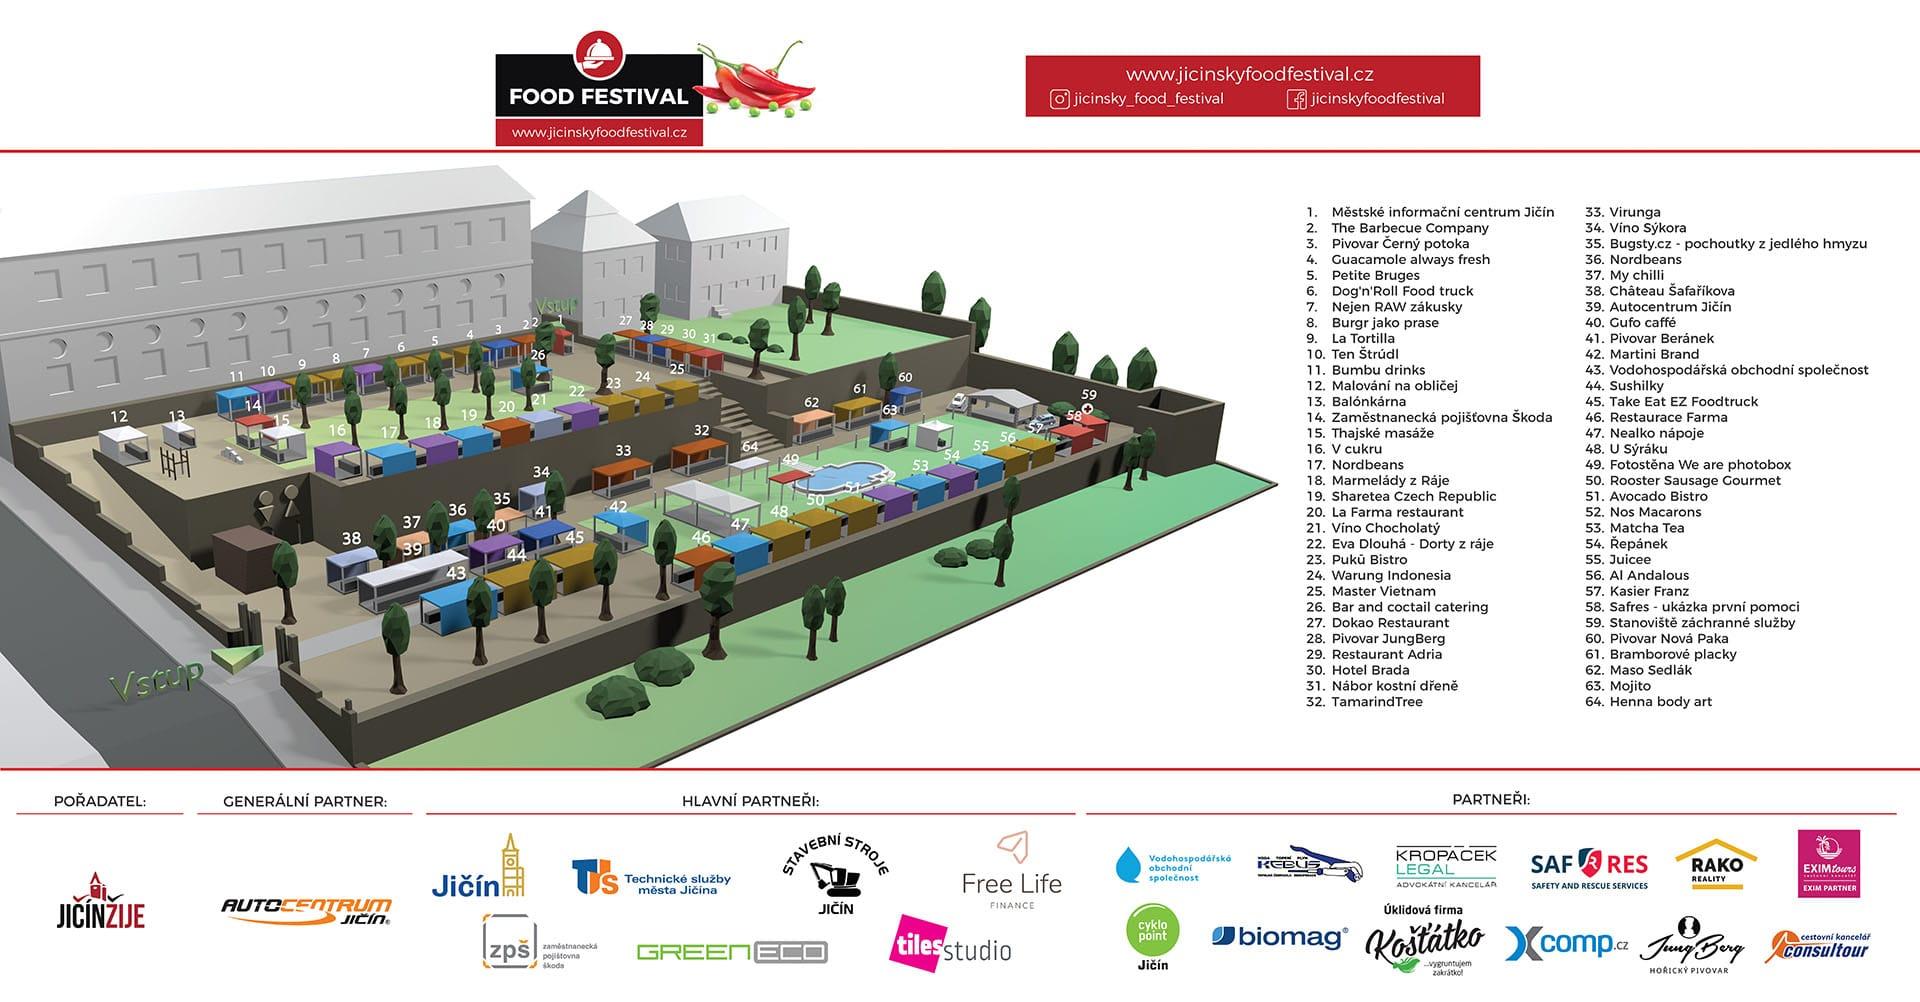 Jičínský Food Festival 2021 - 3D mapa